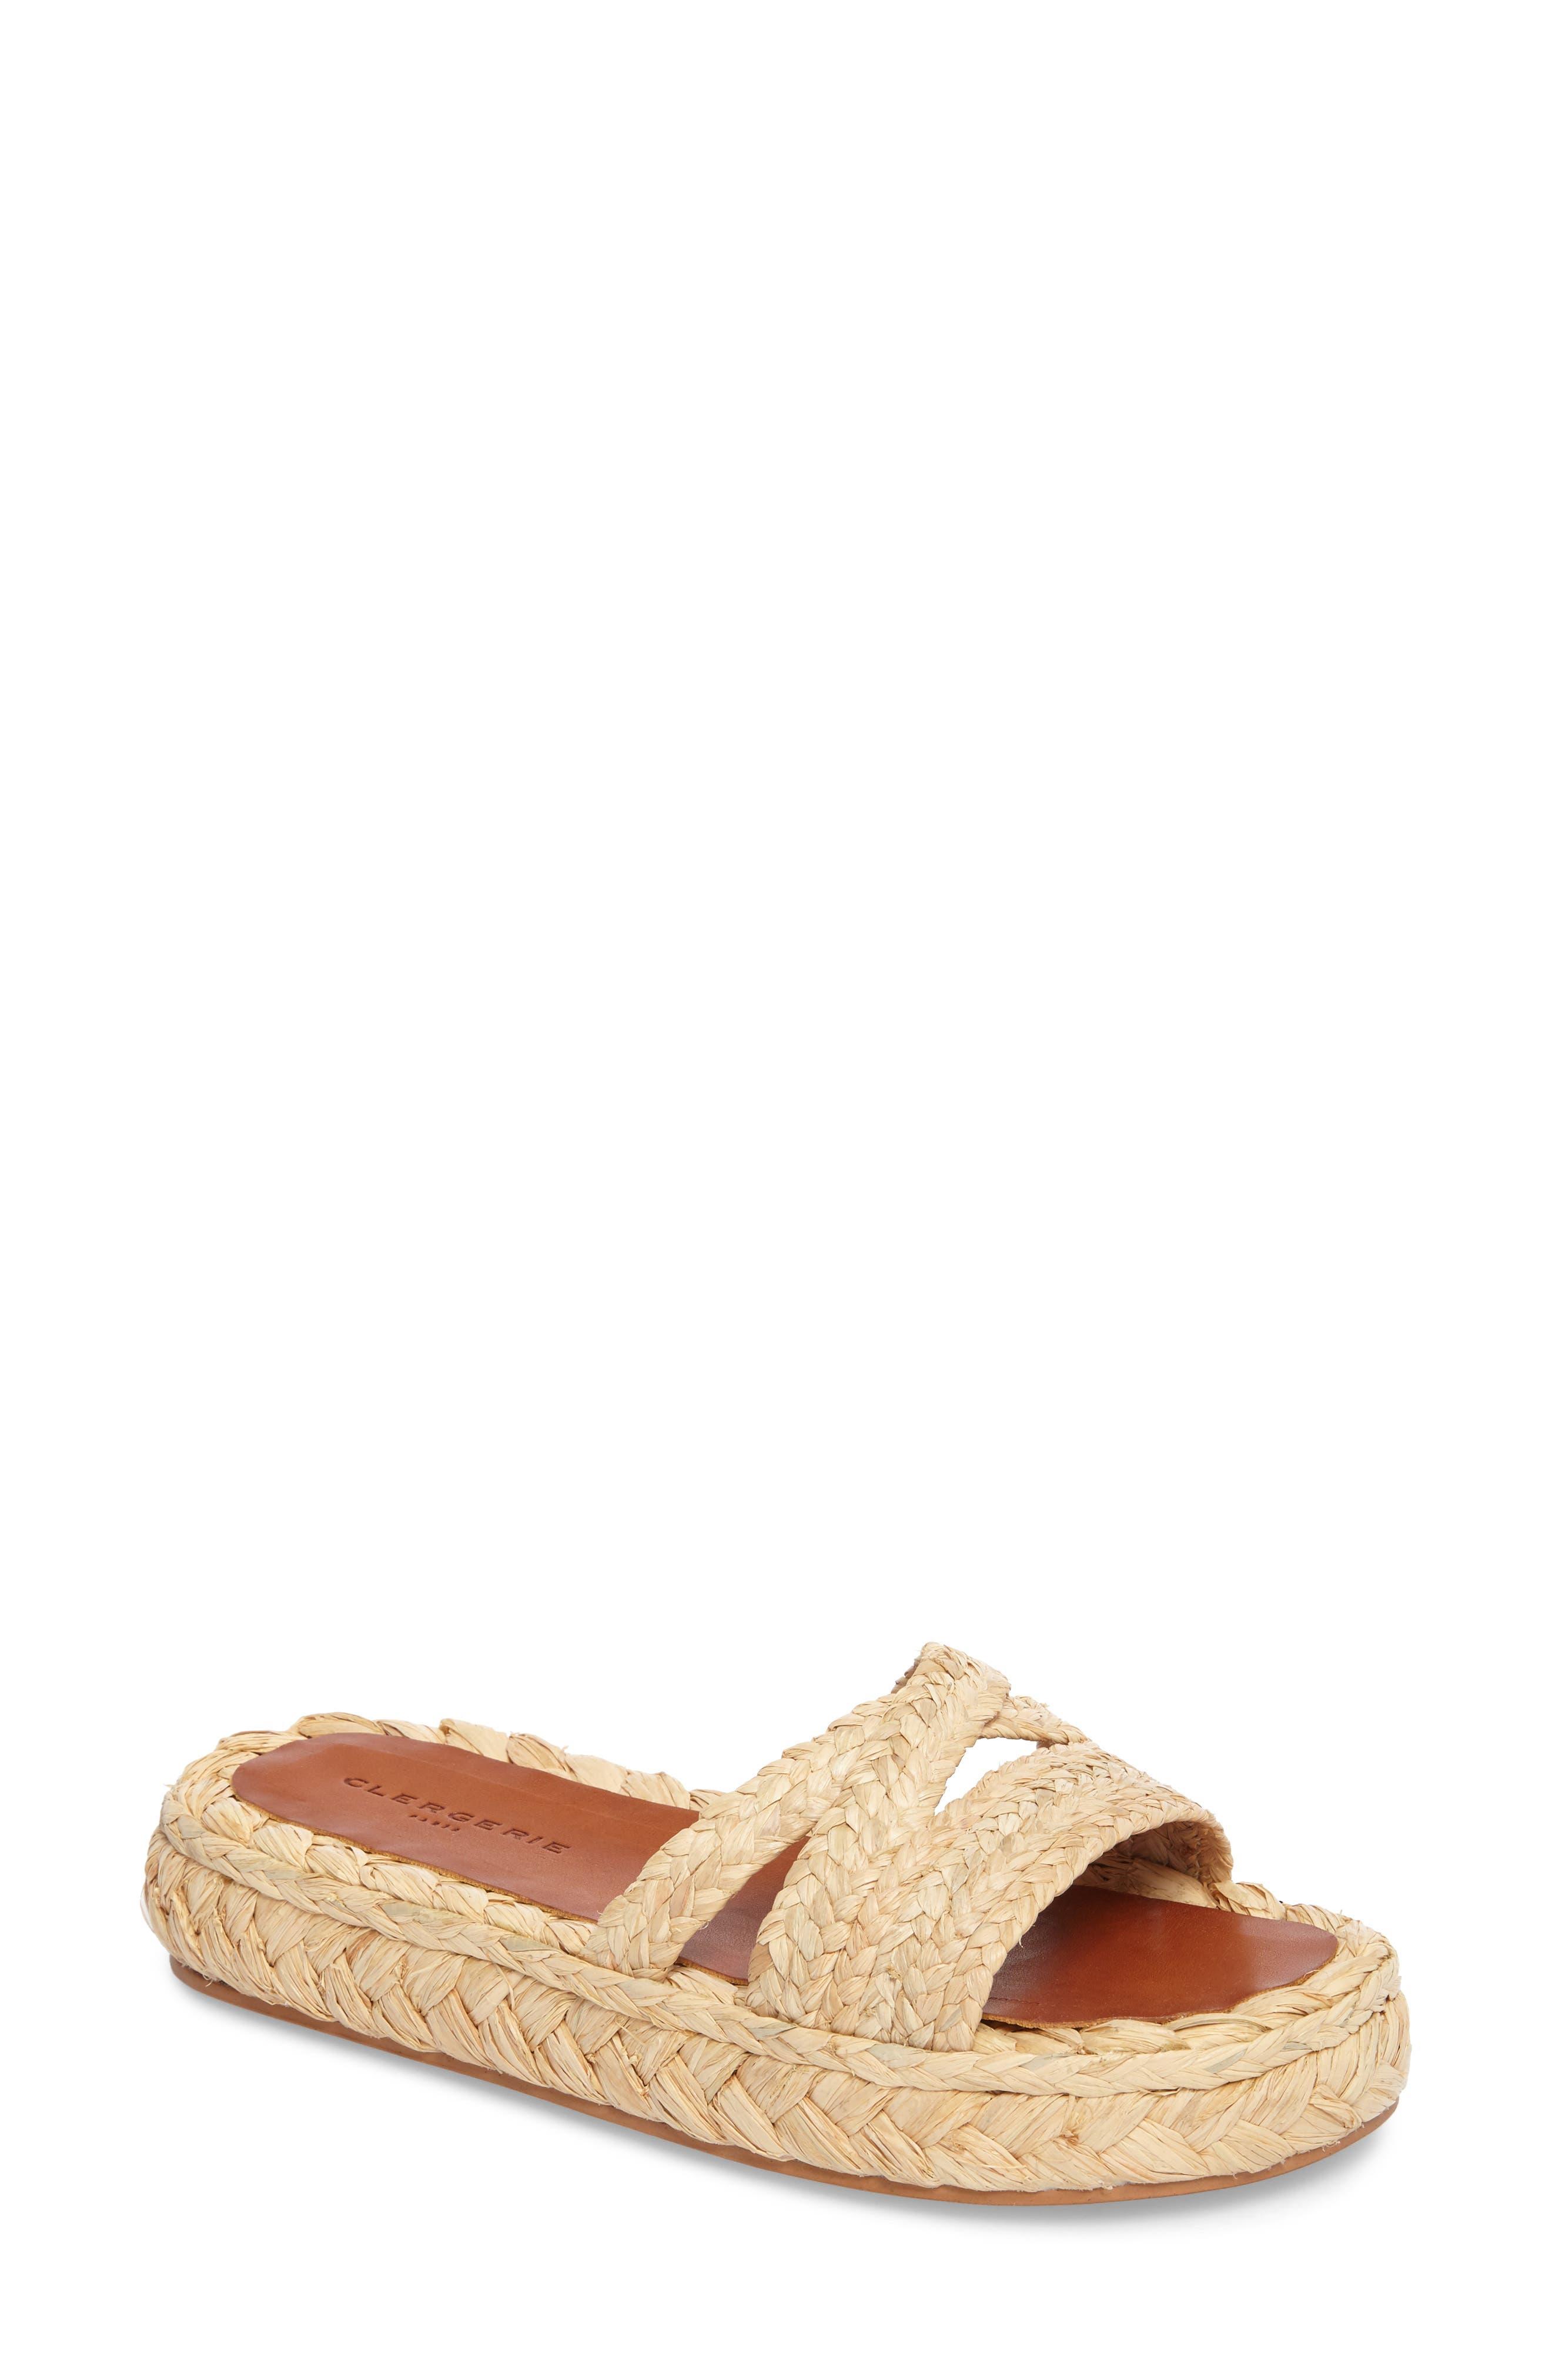 Idalie Woven Slide Sandal,                         Main,                         color, 250